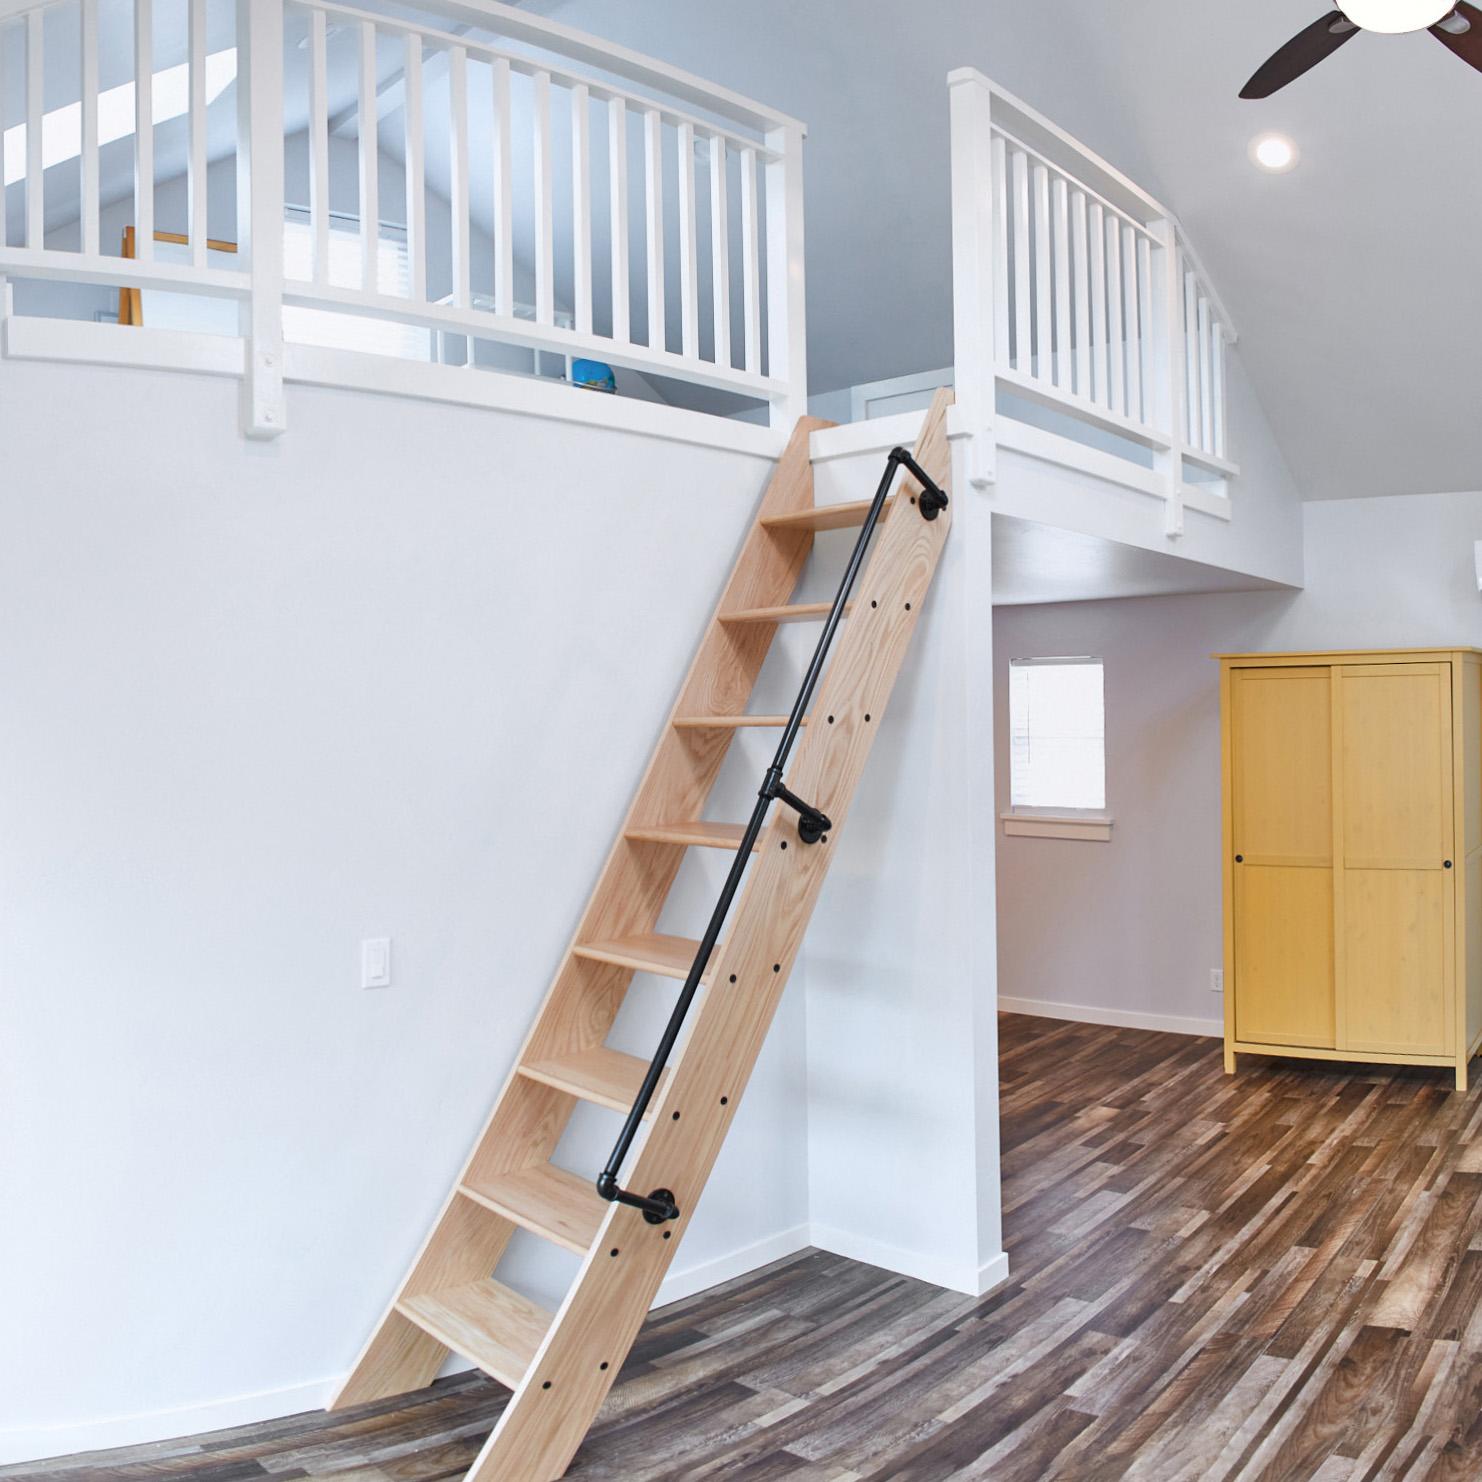 s-new-build-adu-with-loft-santa-cruz.jpg